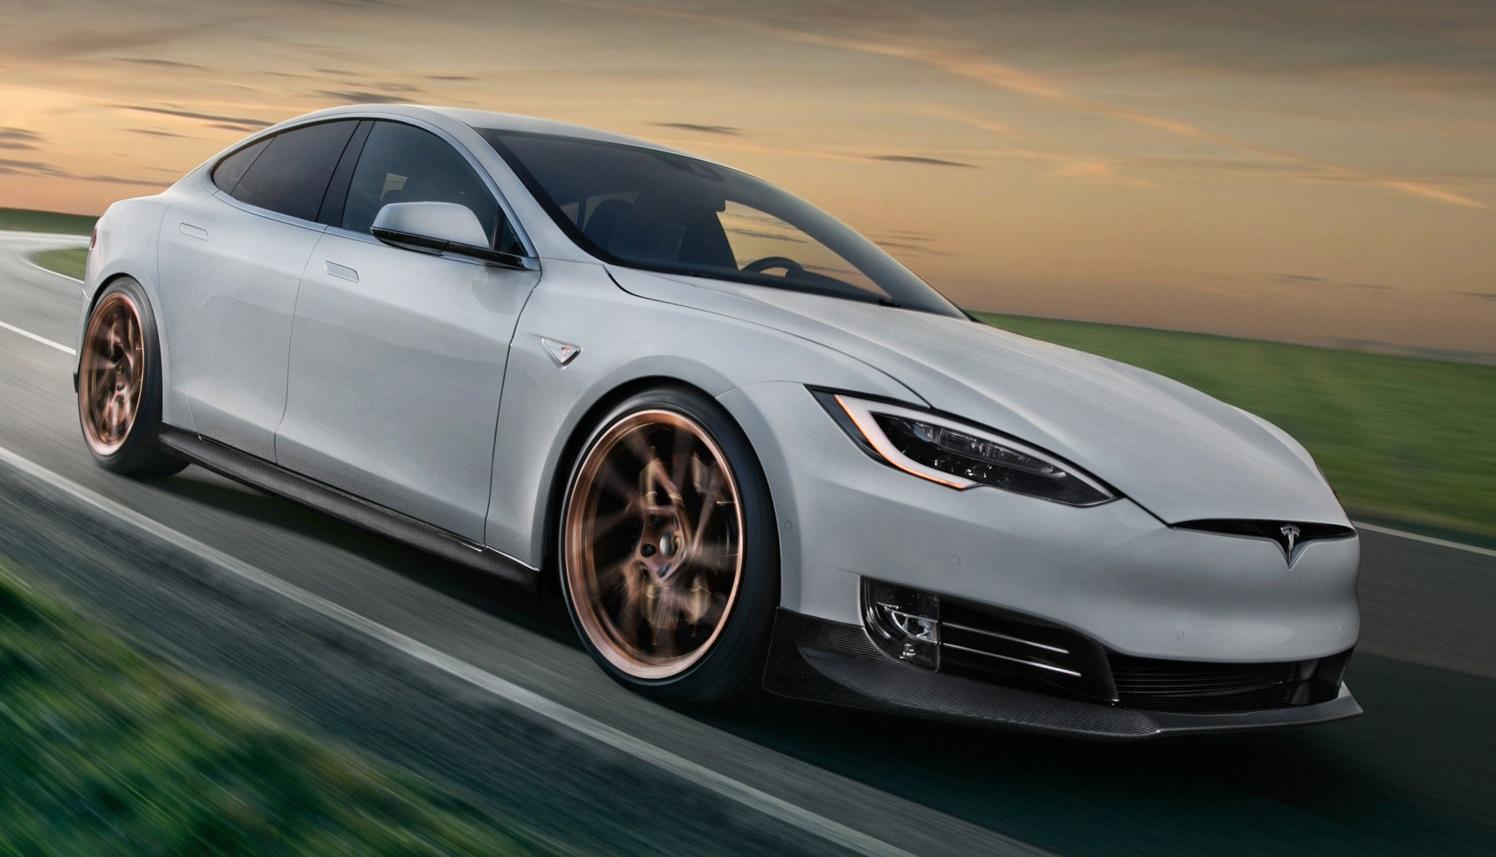 Novitec Tesla Model S Features Subtle Improvements